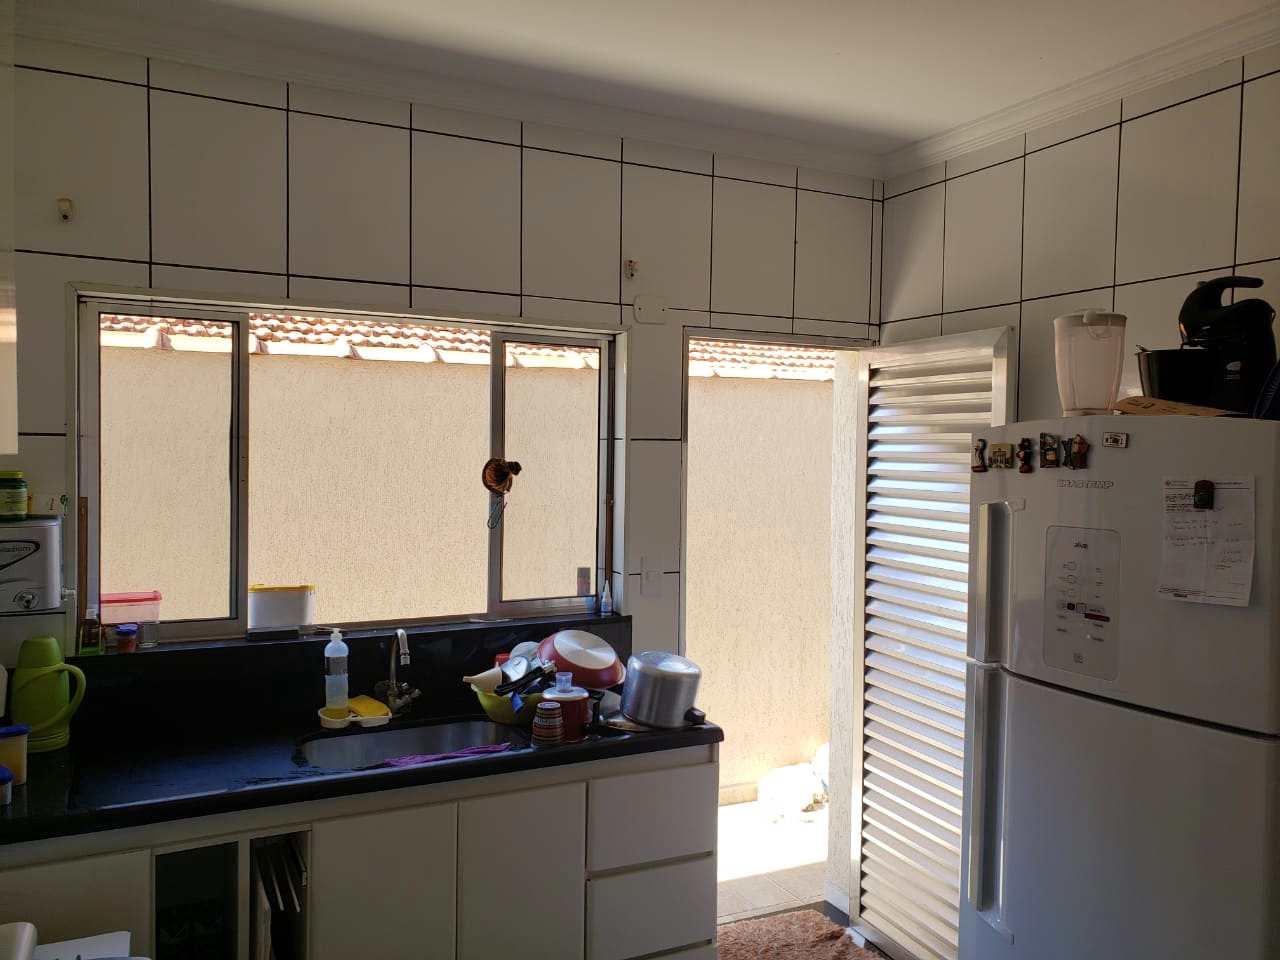 Casa com 3 dorms, Jardim Vera Cruz(Zona Leste), São Paulo - R$ 395 mil, Cod: 11341